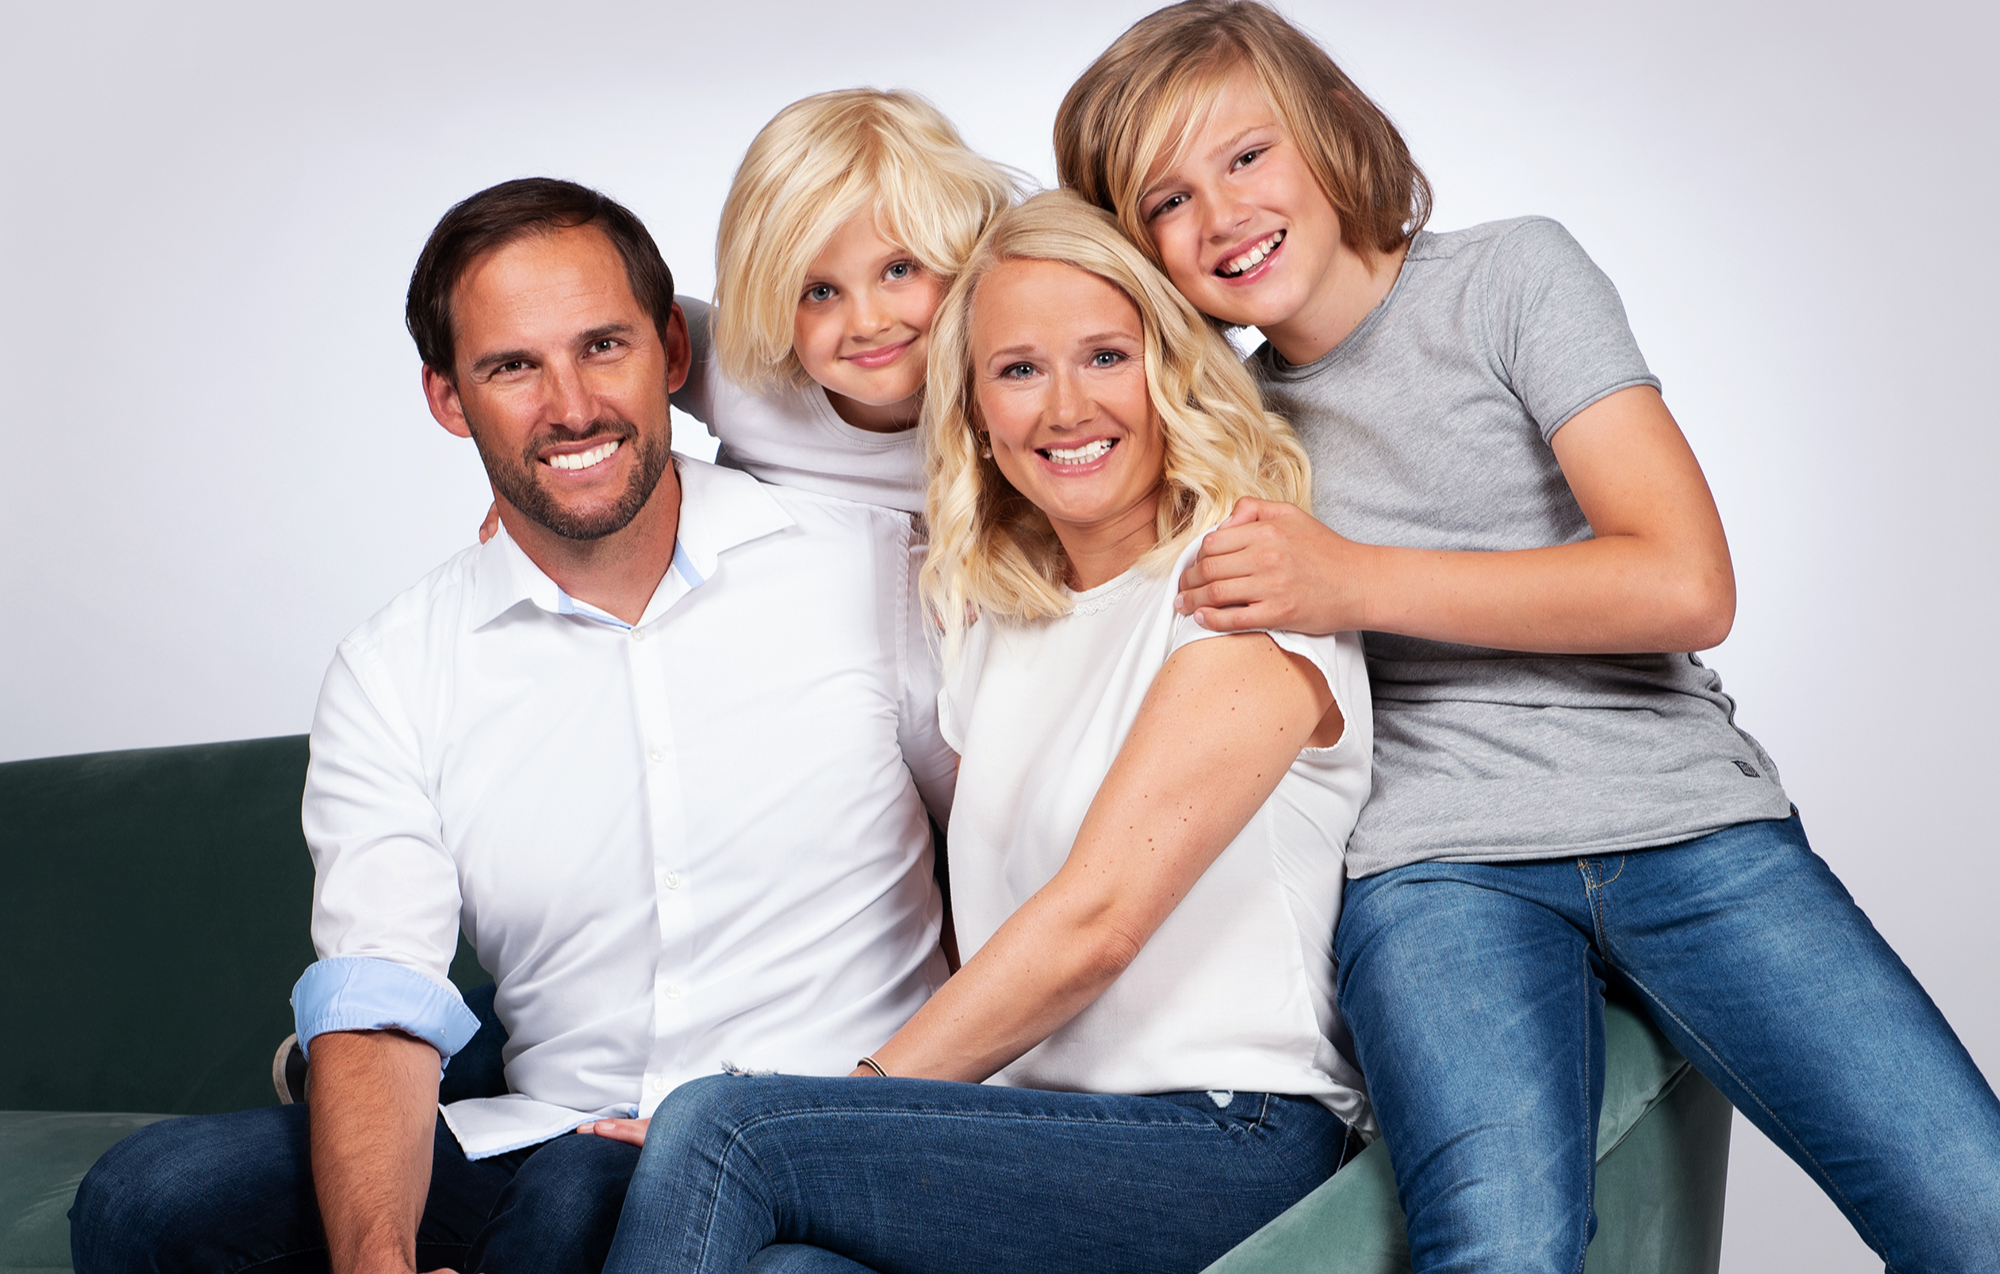 familien-fotoshooting-passau-bg51612881662